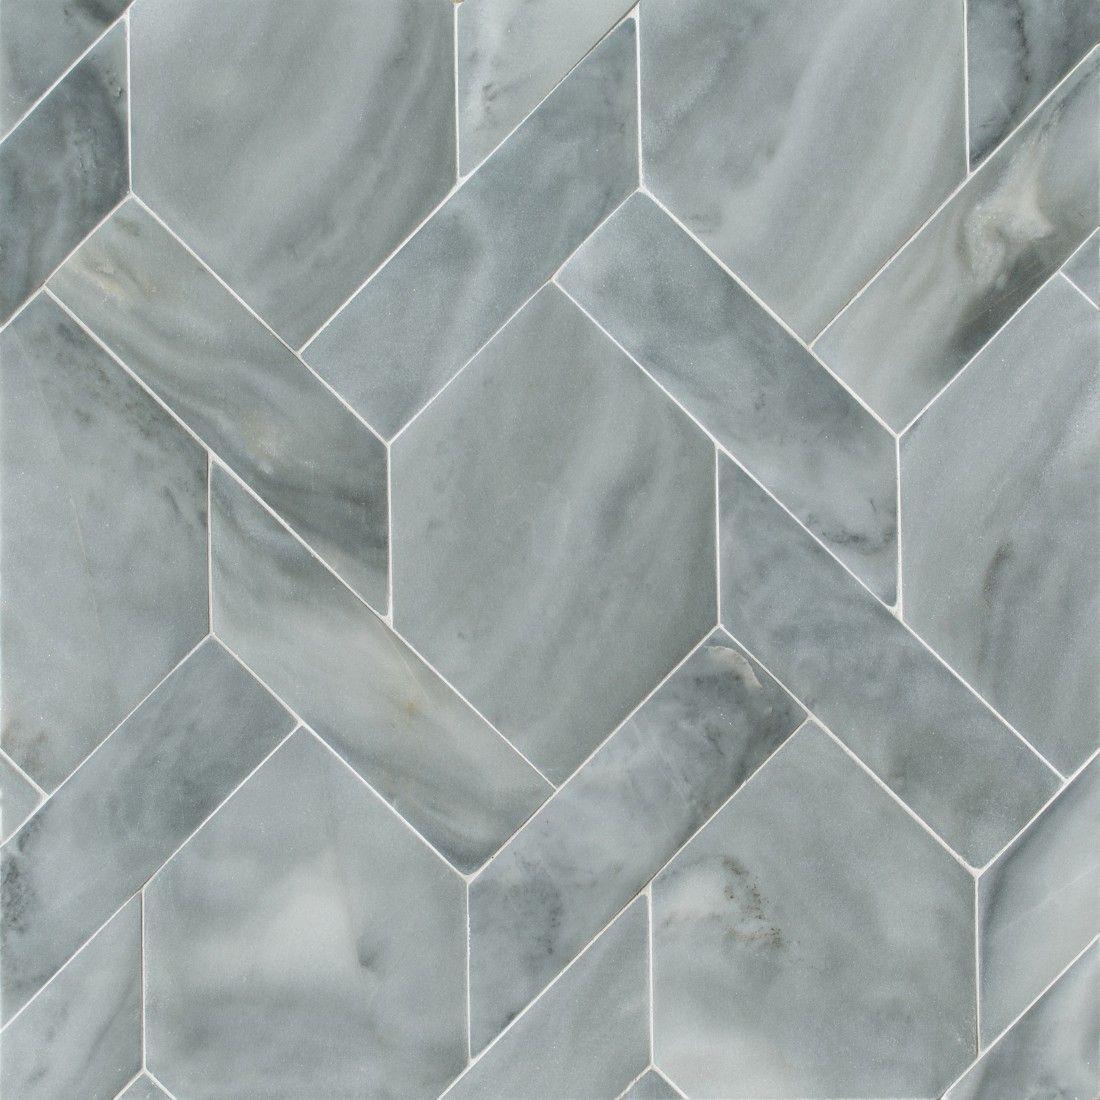 Beau Monde Mosaics Ann Sacks Tile Stone Tyrone Mosaic In Greystroke Tiles Ann Sacks Tiles Ceramic Tile Floor Bathroom